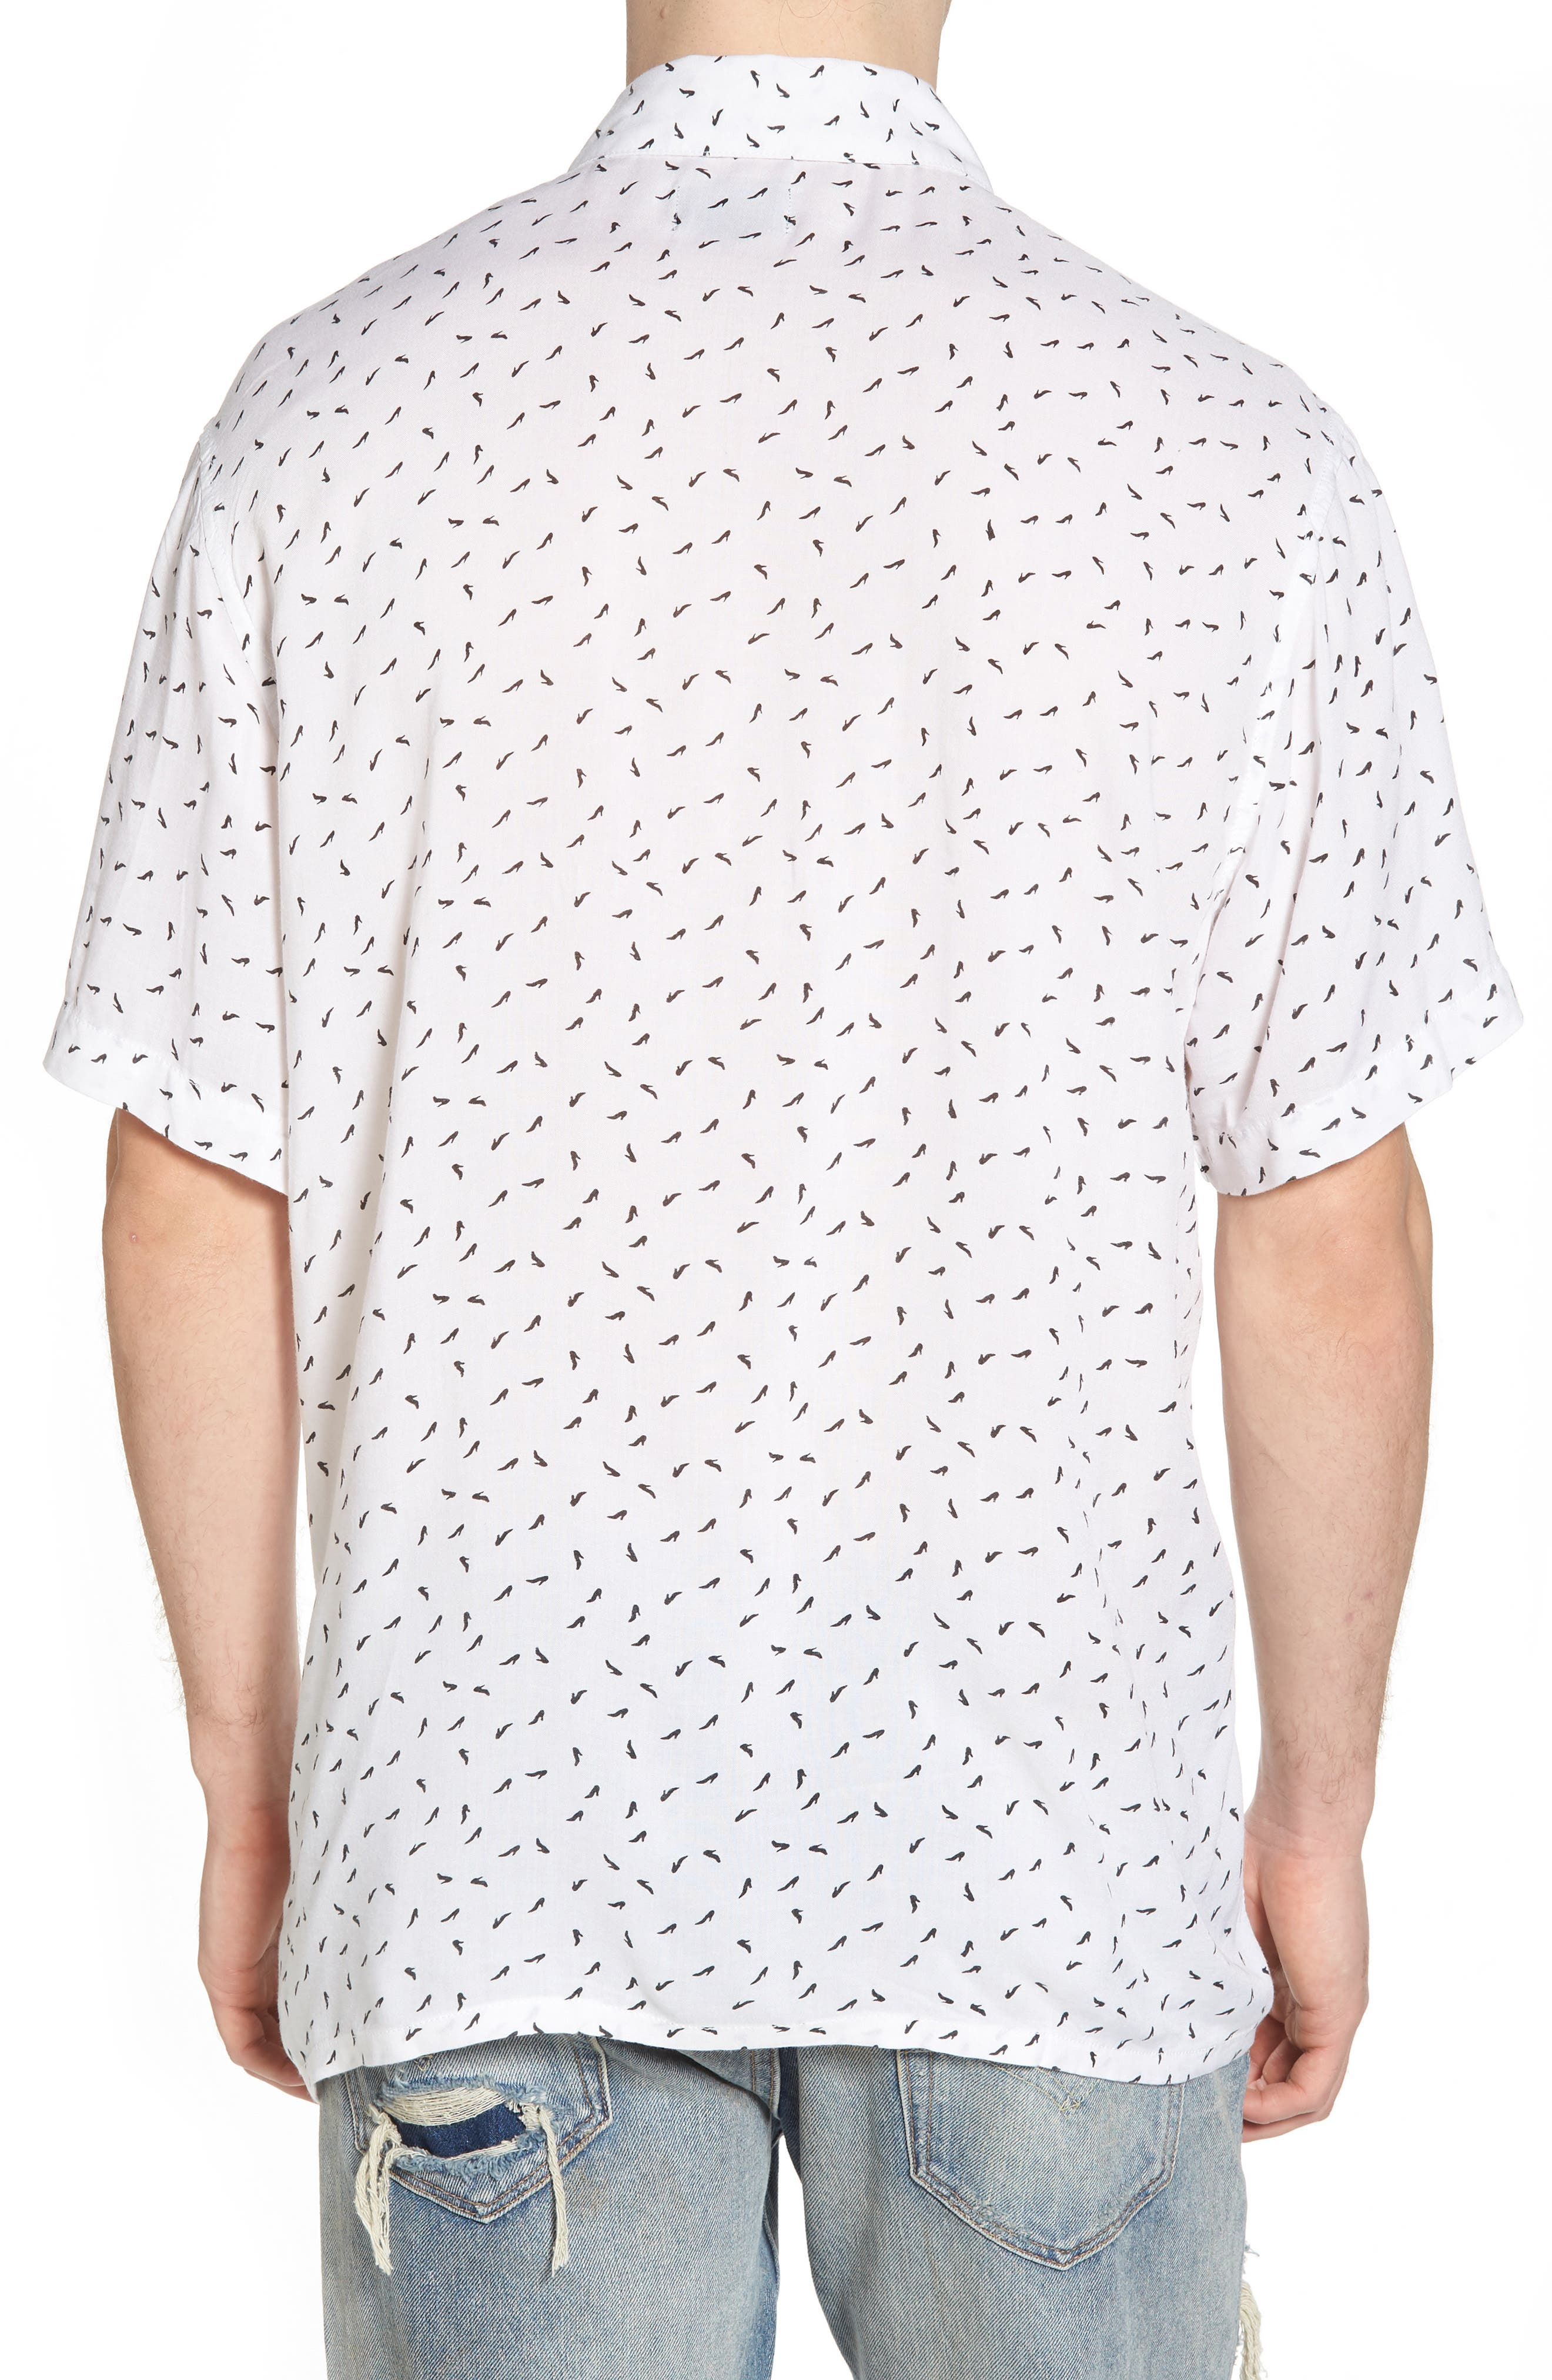 Pumps Short Sleeve Shirt,                             Alternate thumbnail 2, color,                             White Multi